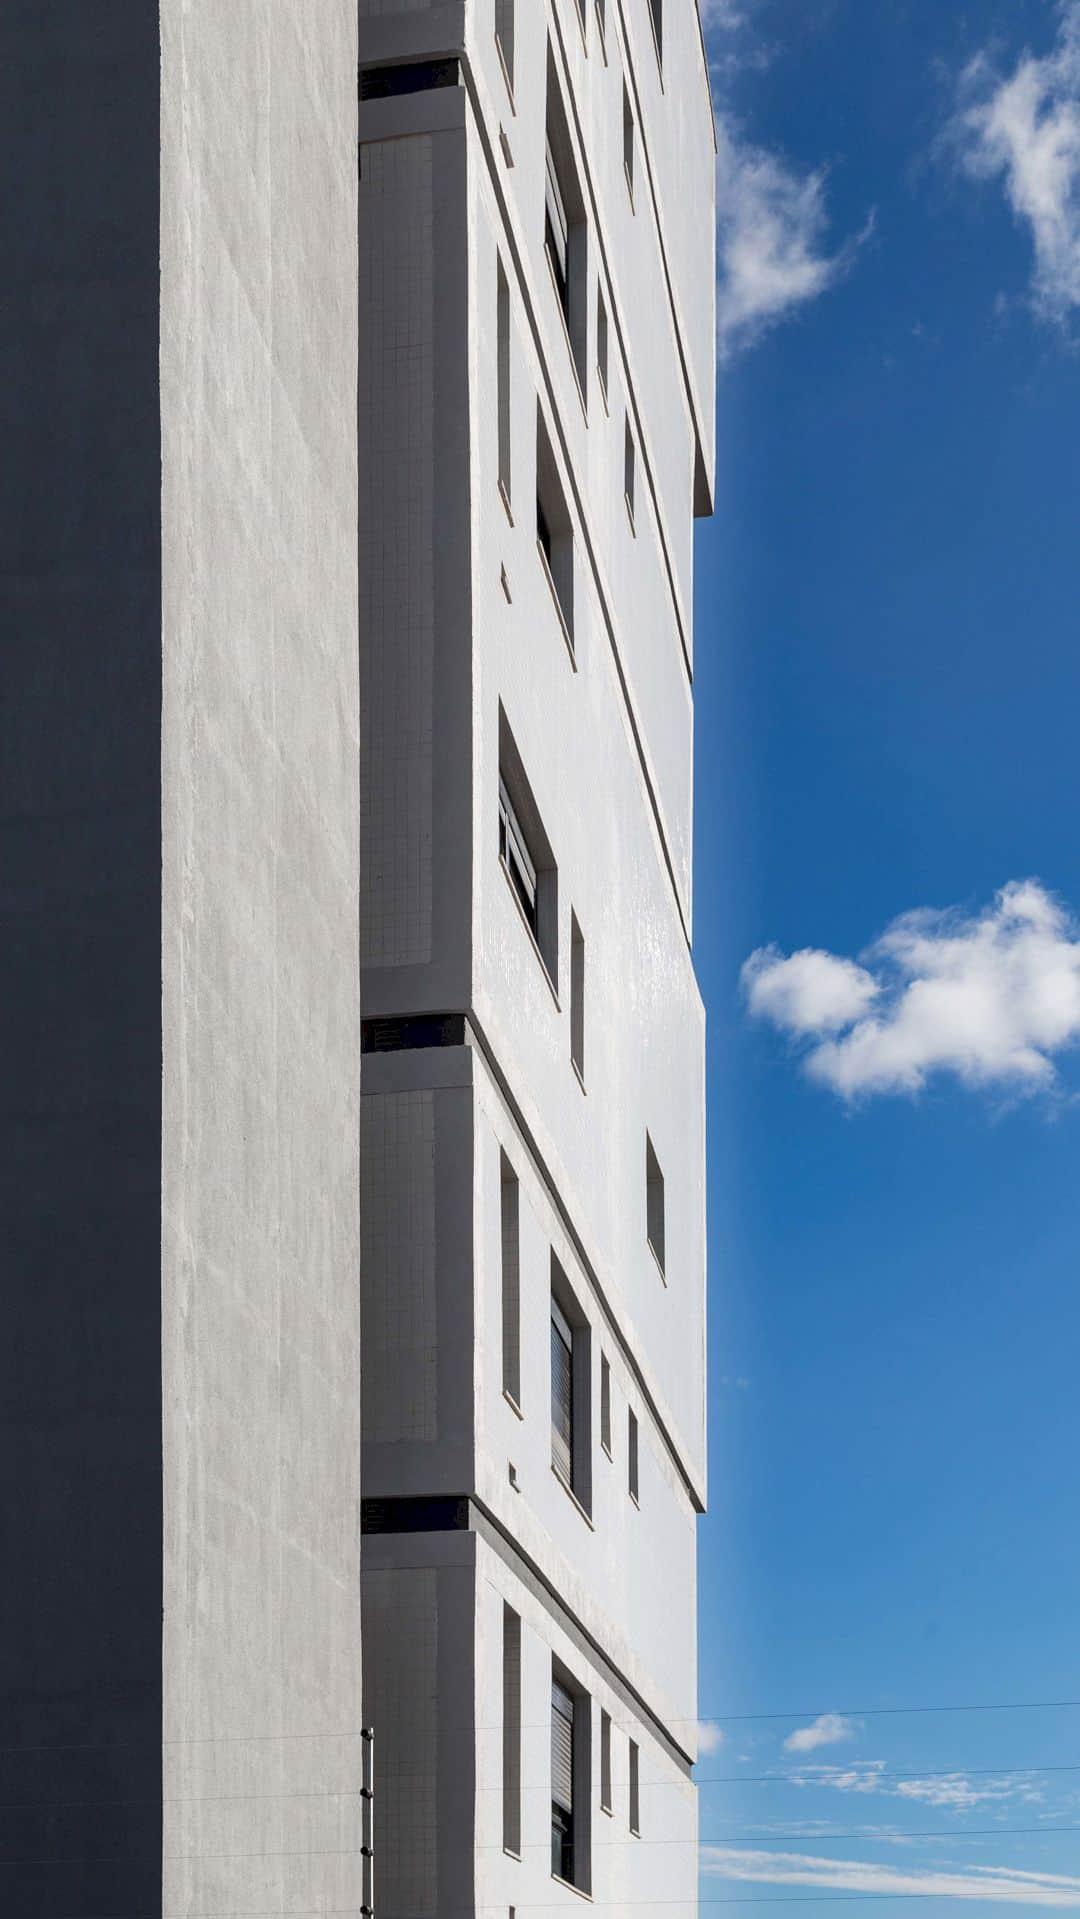 Fernando Abbott 866 A High Rise Residential Building In Porto Alegre 15